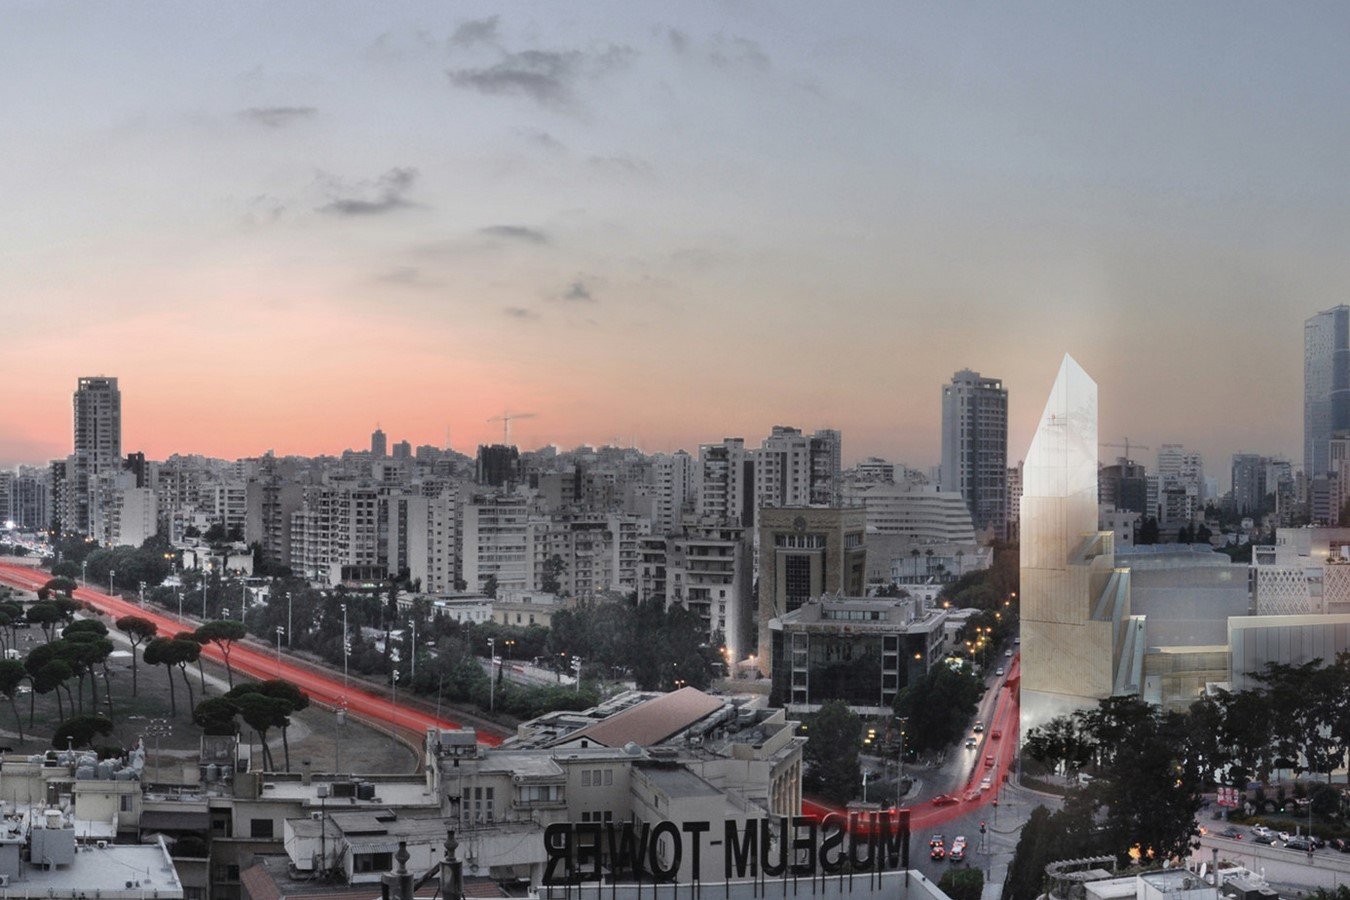 BeMA: Beirut Museum of Art by Lina Ghotmeh: The Urban Theatre - Sheet1